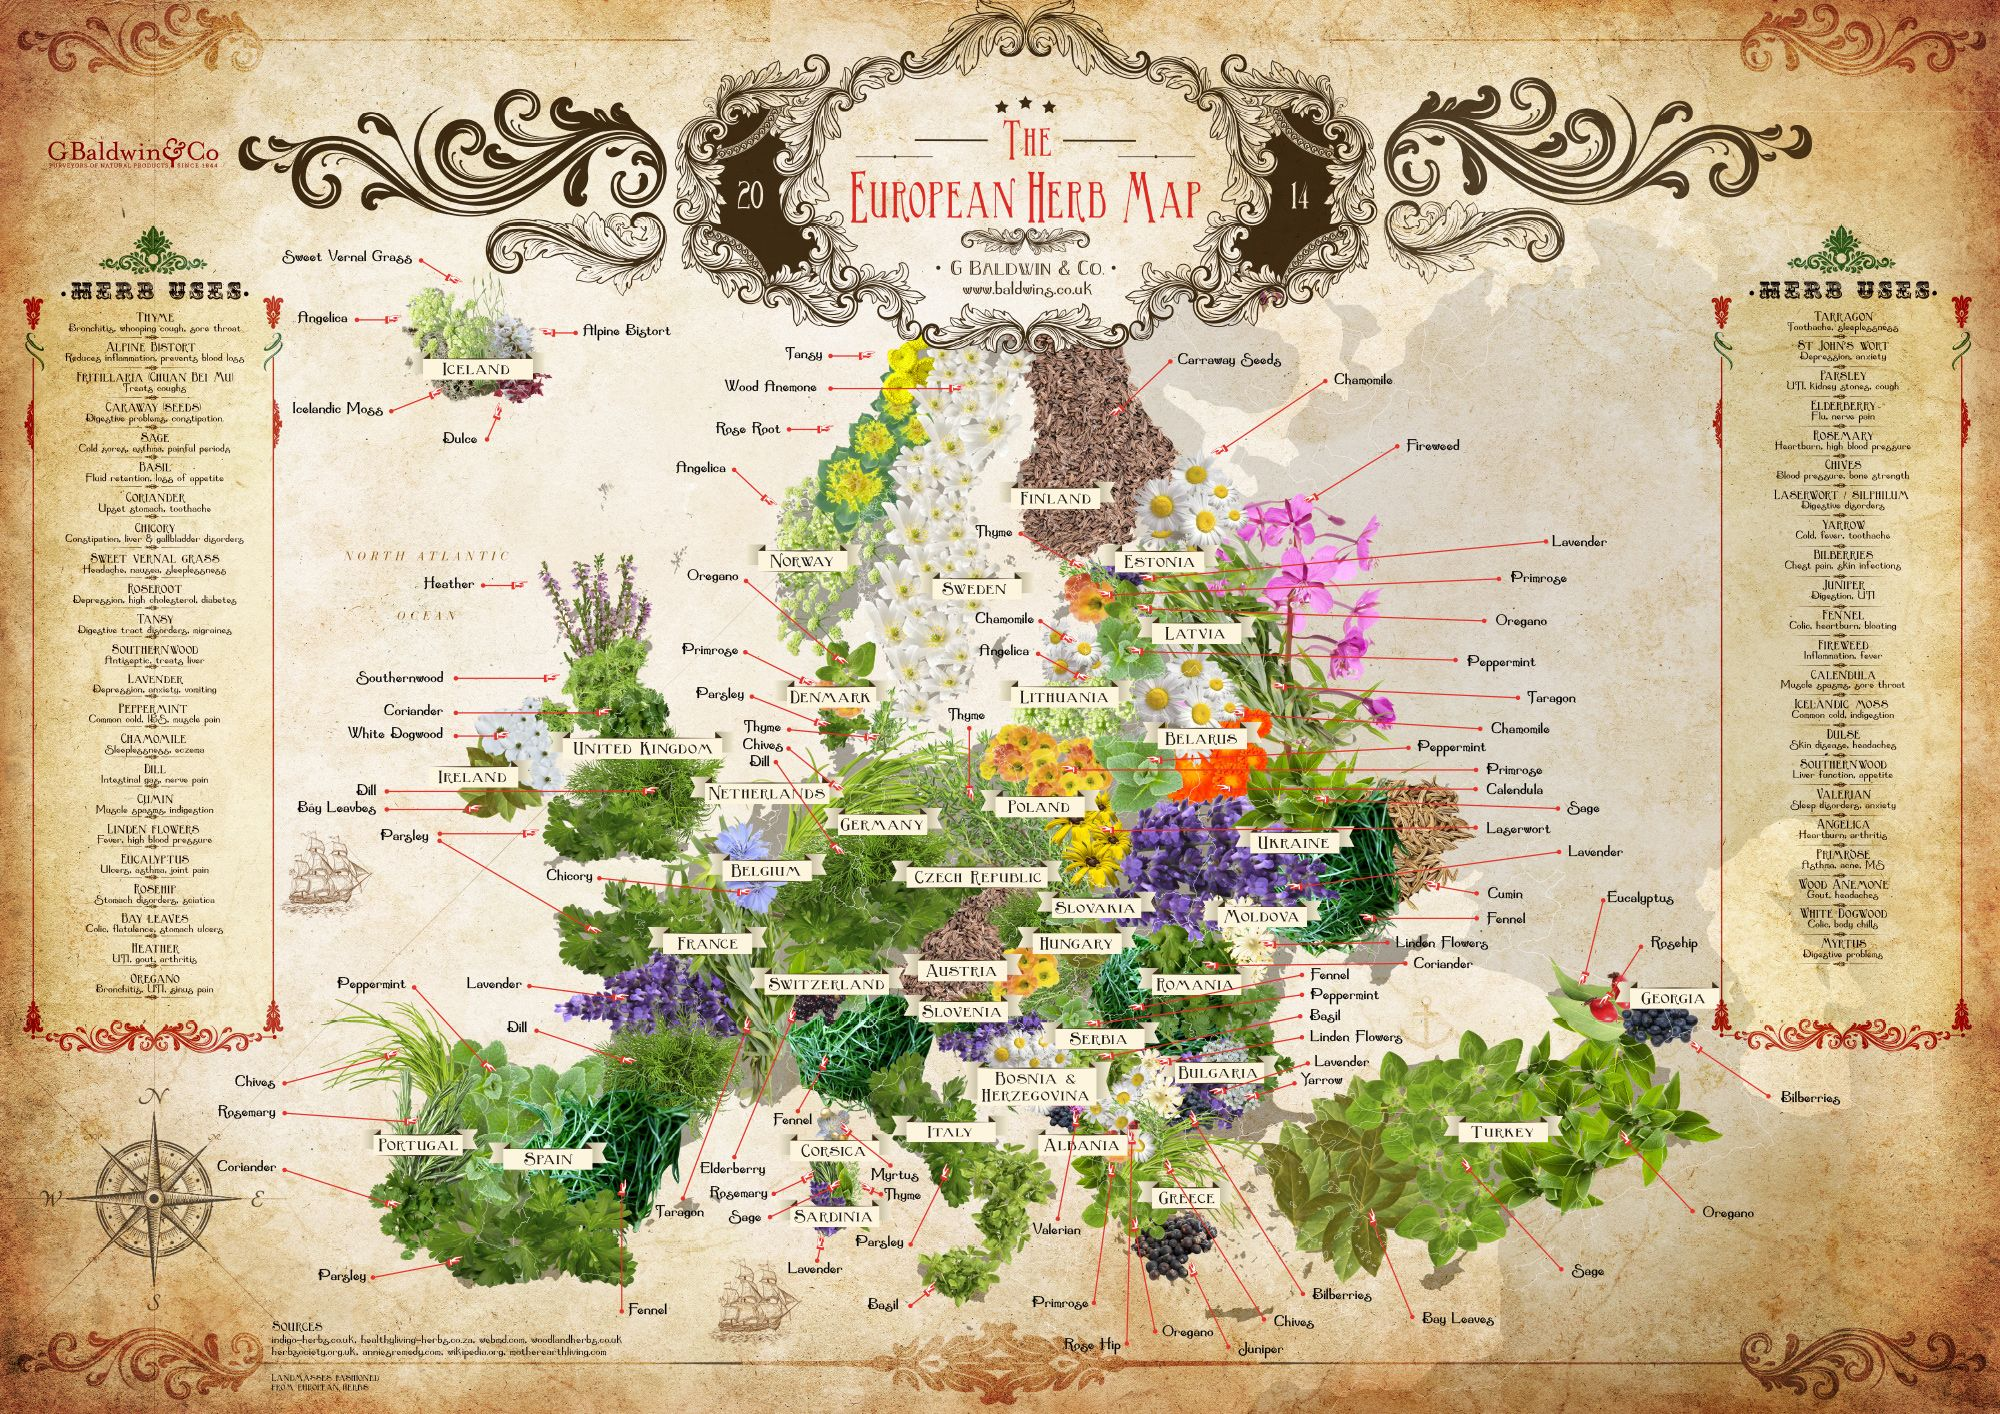 Baldwins european herb map chinese herb map and world of tea map baldwins european herb map chinese herb map and world of tea map to gumiabroncs Gallery